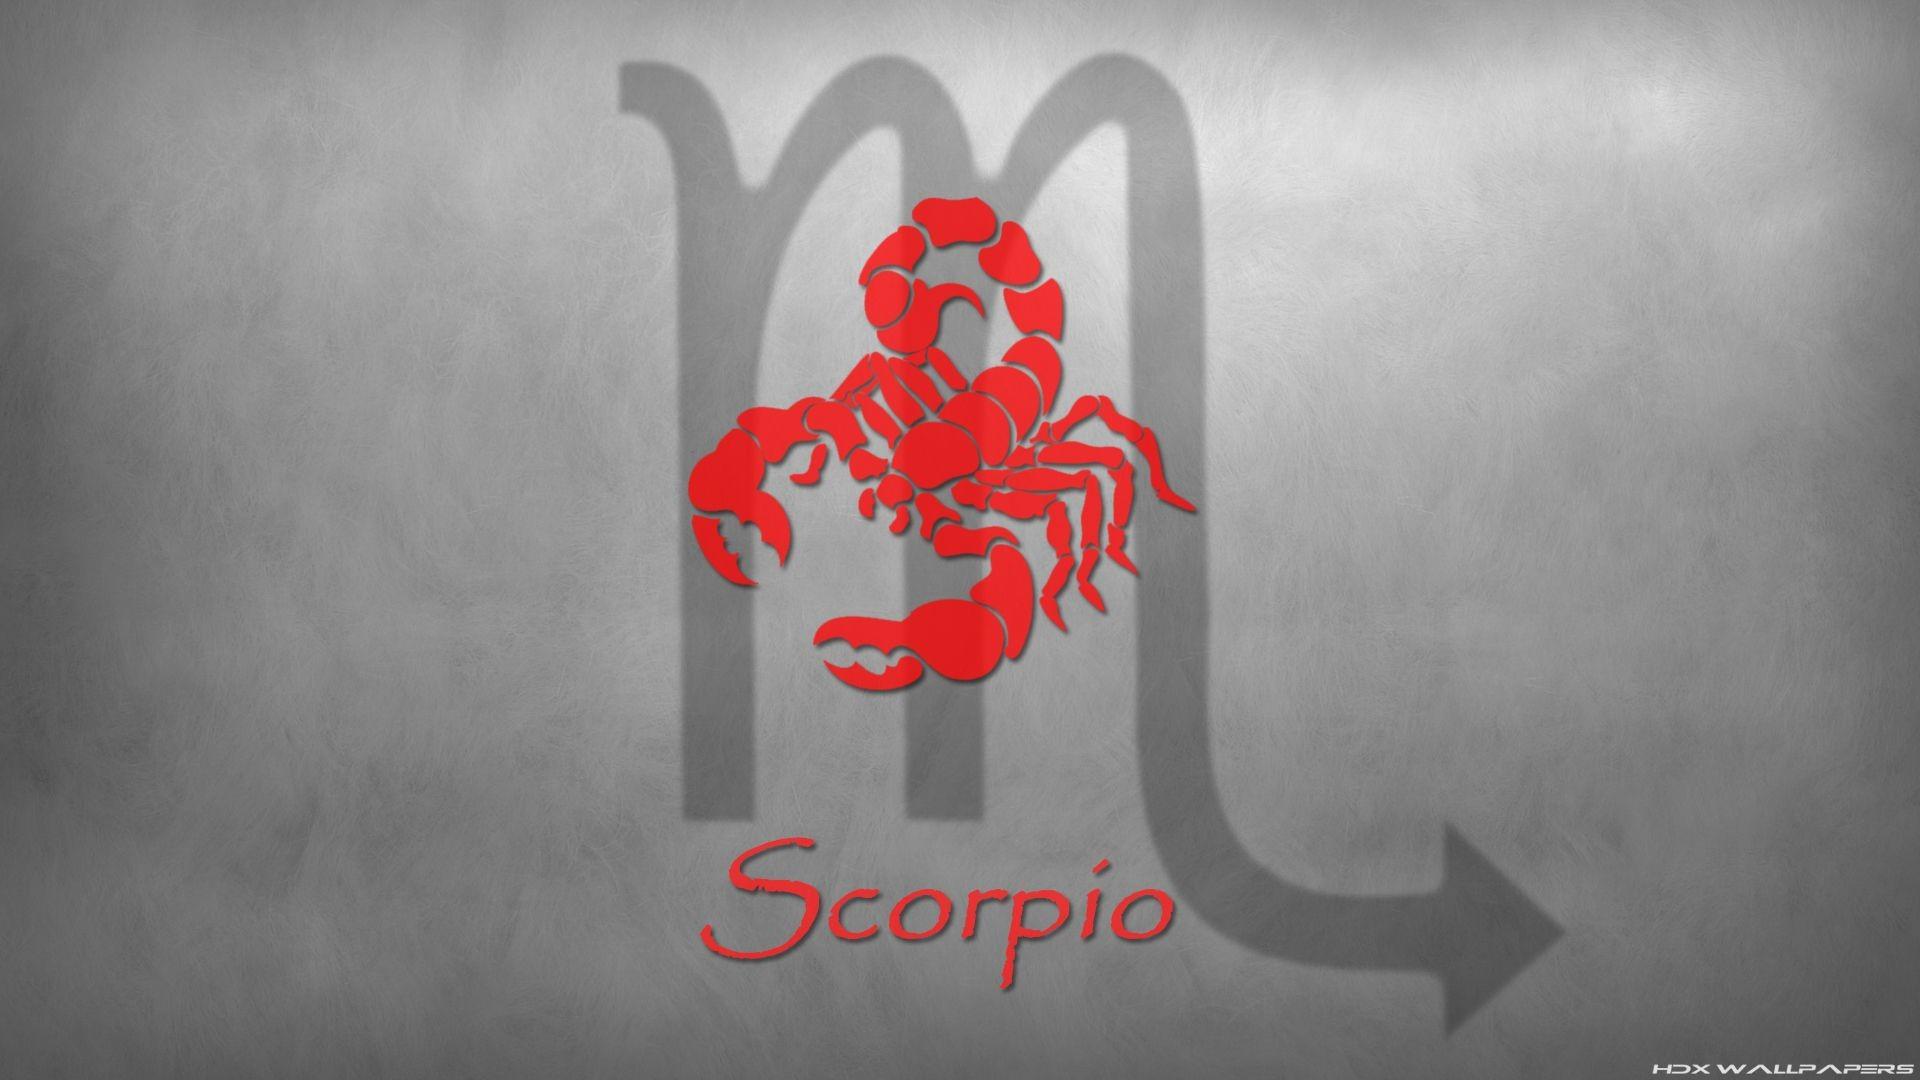 Res: 1920x1080, Scorpio Zodiac Sign Wallpaper | Zodiac_signs_Sign_Scorpio_047563_.jpg